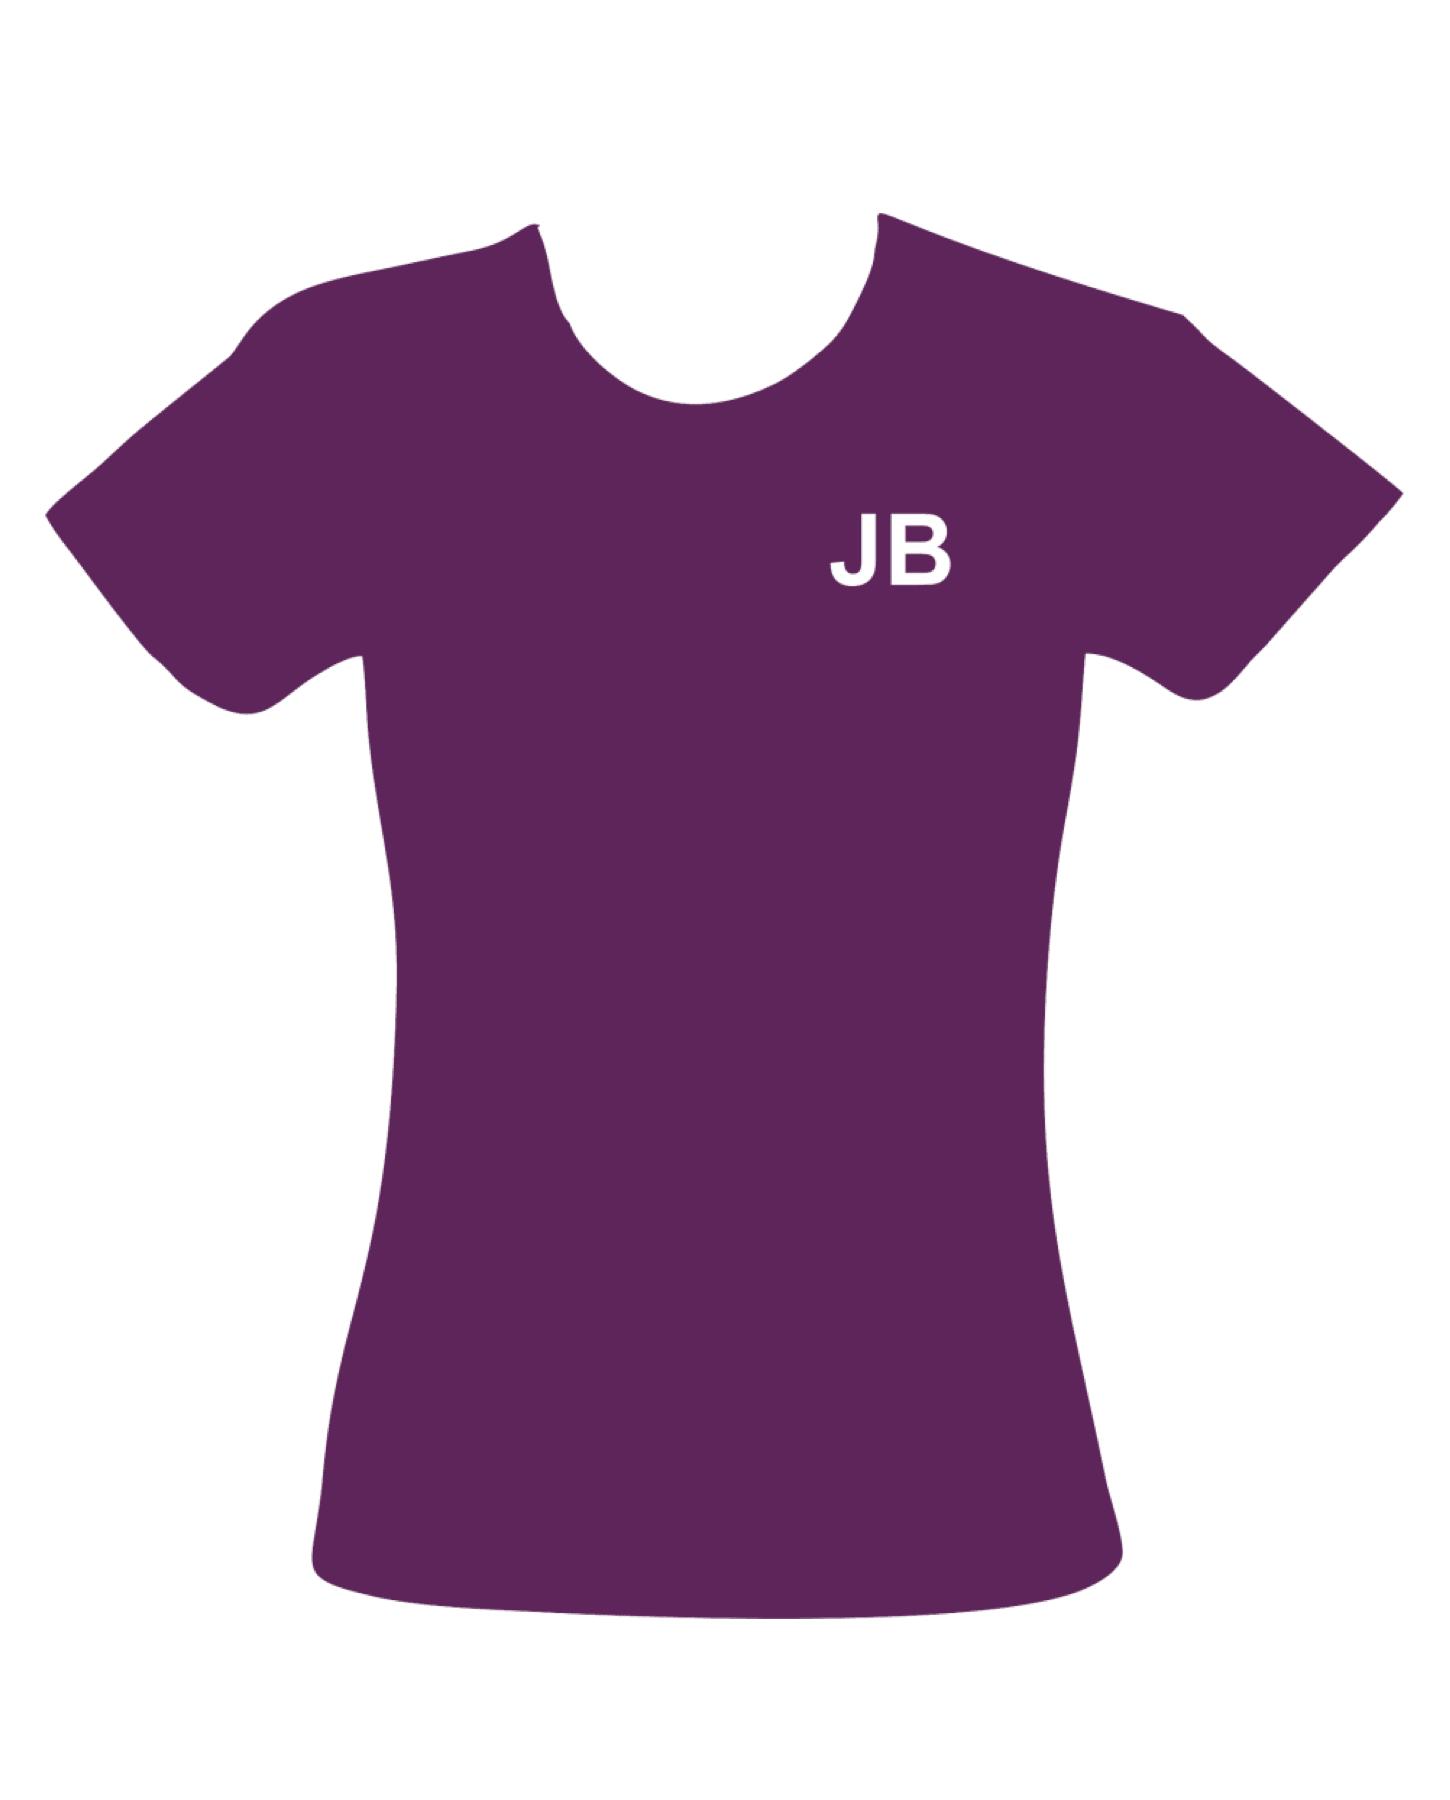 Cottenham Jaguars Netball Club – T-Shirt Kids